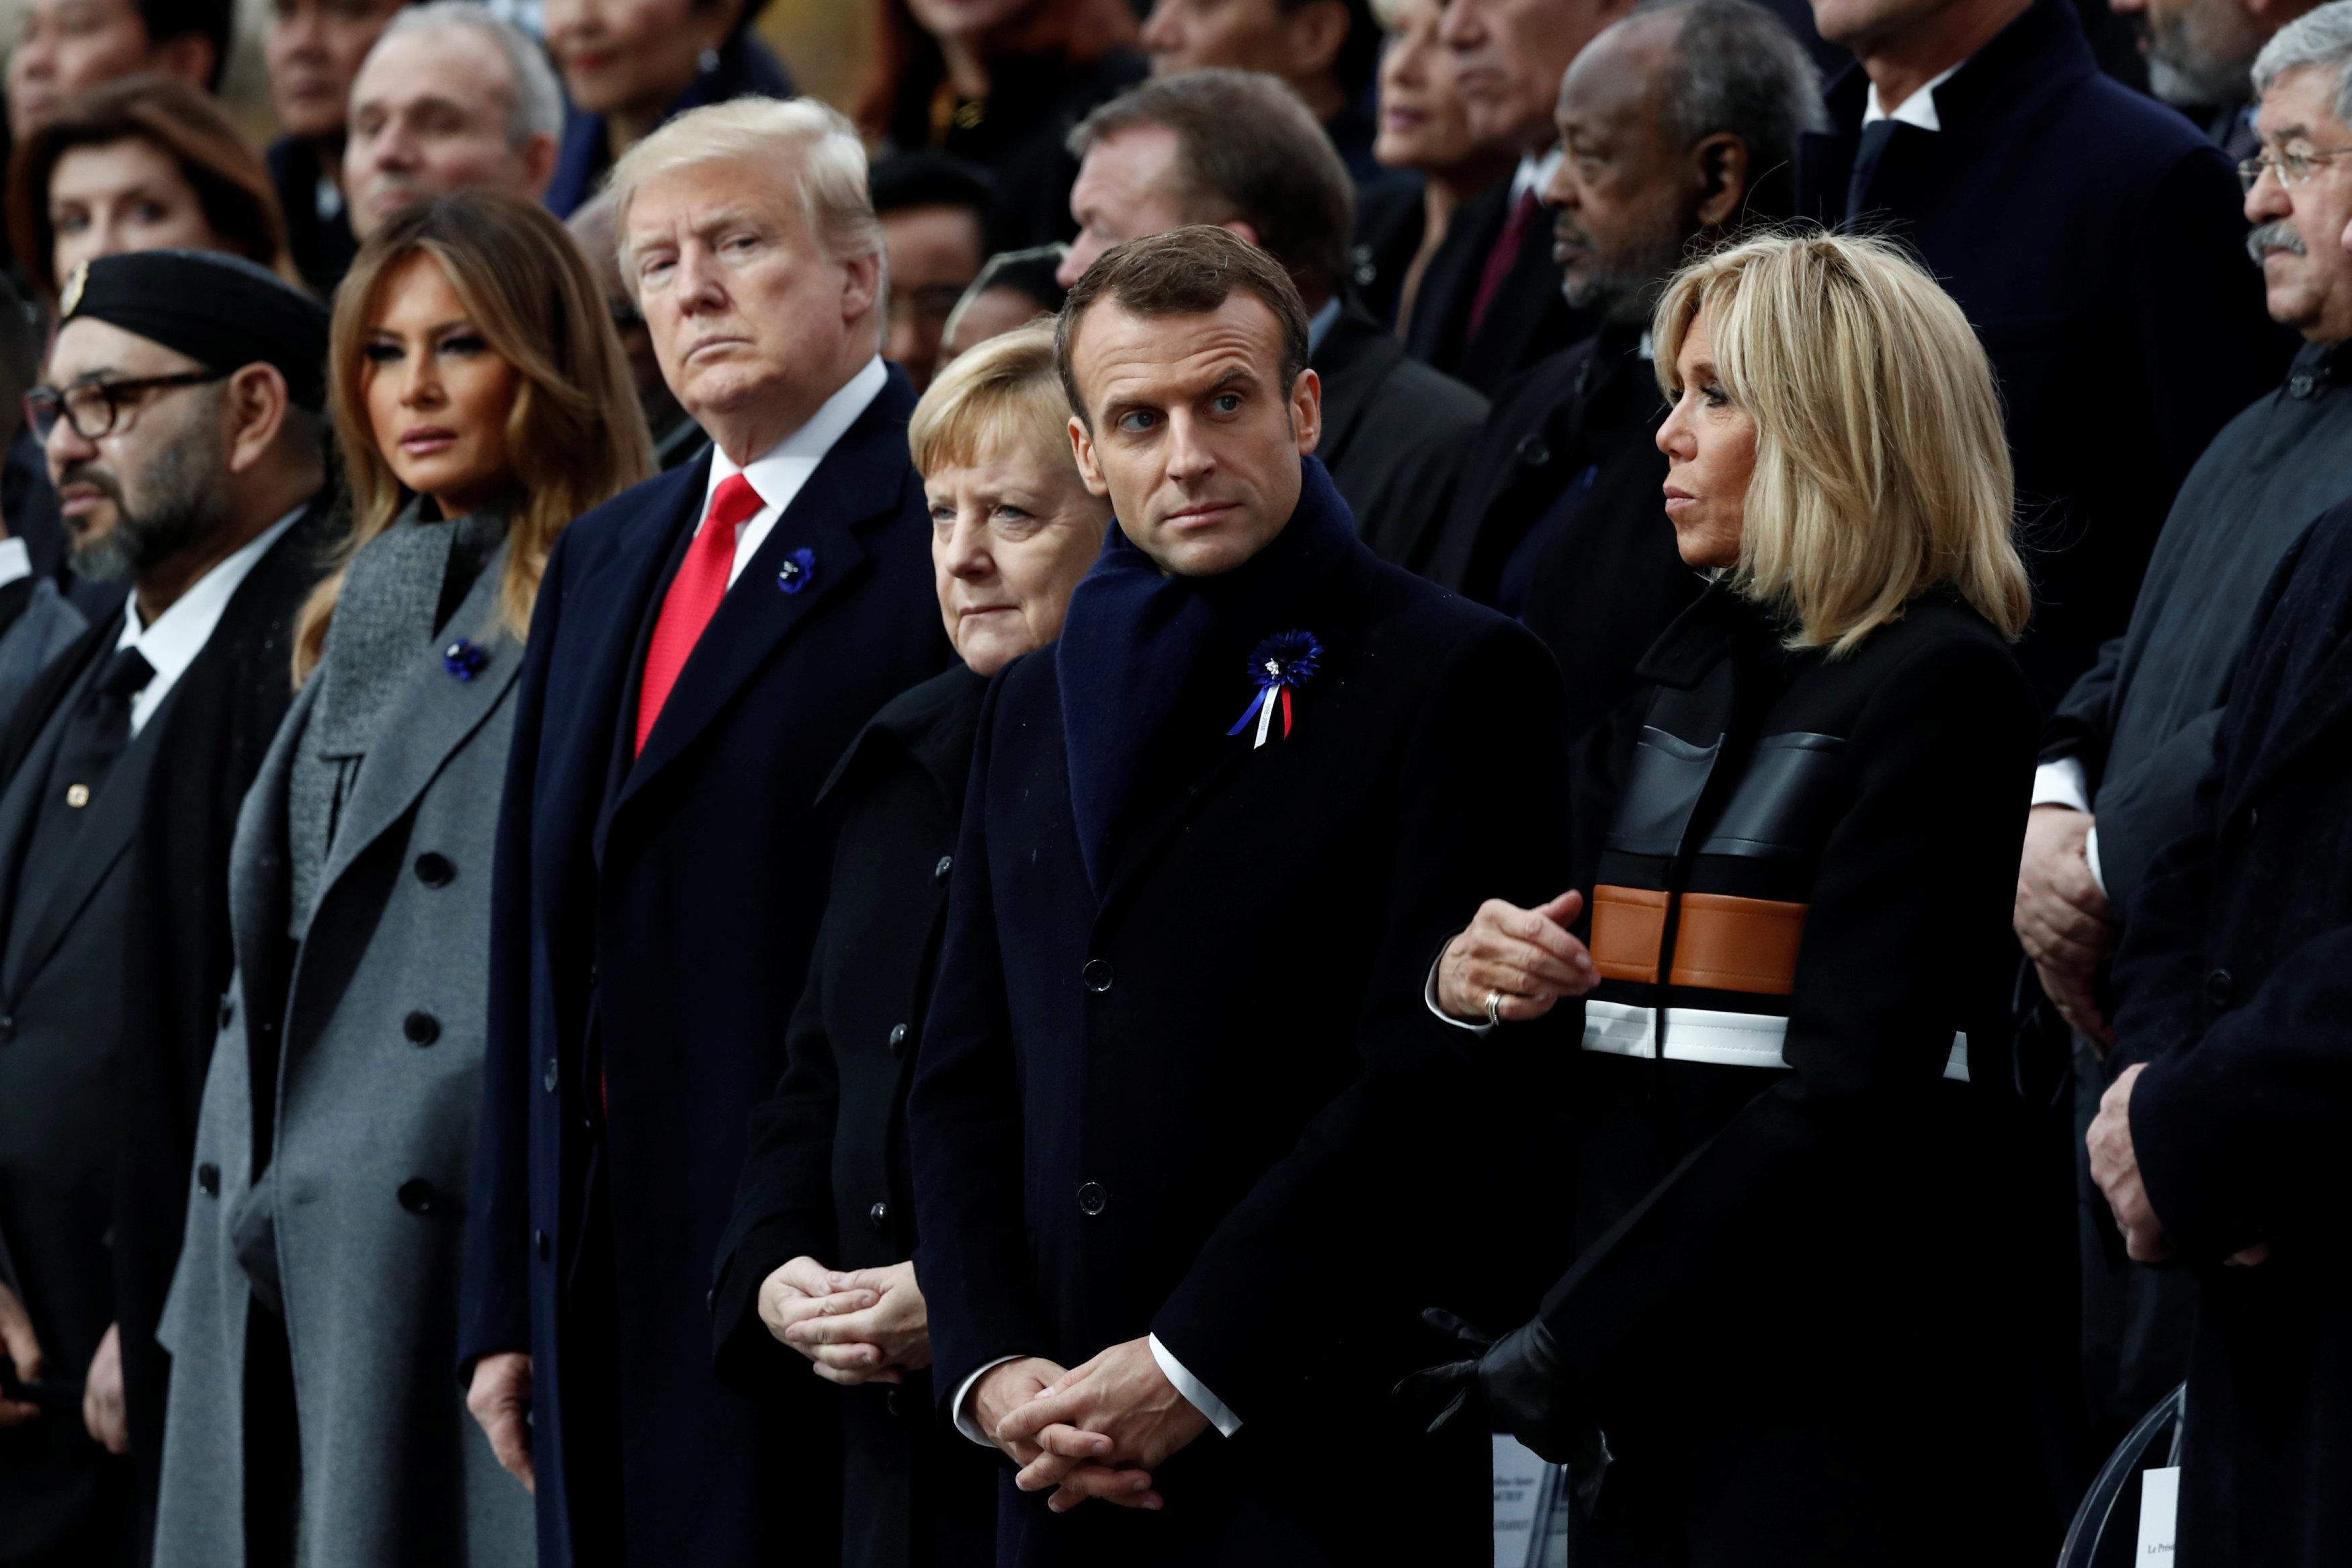 U.S. President Donald Trump and first lady Melania Trump; German Chancellor Angela Merkel; andFrench President Emmanuel